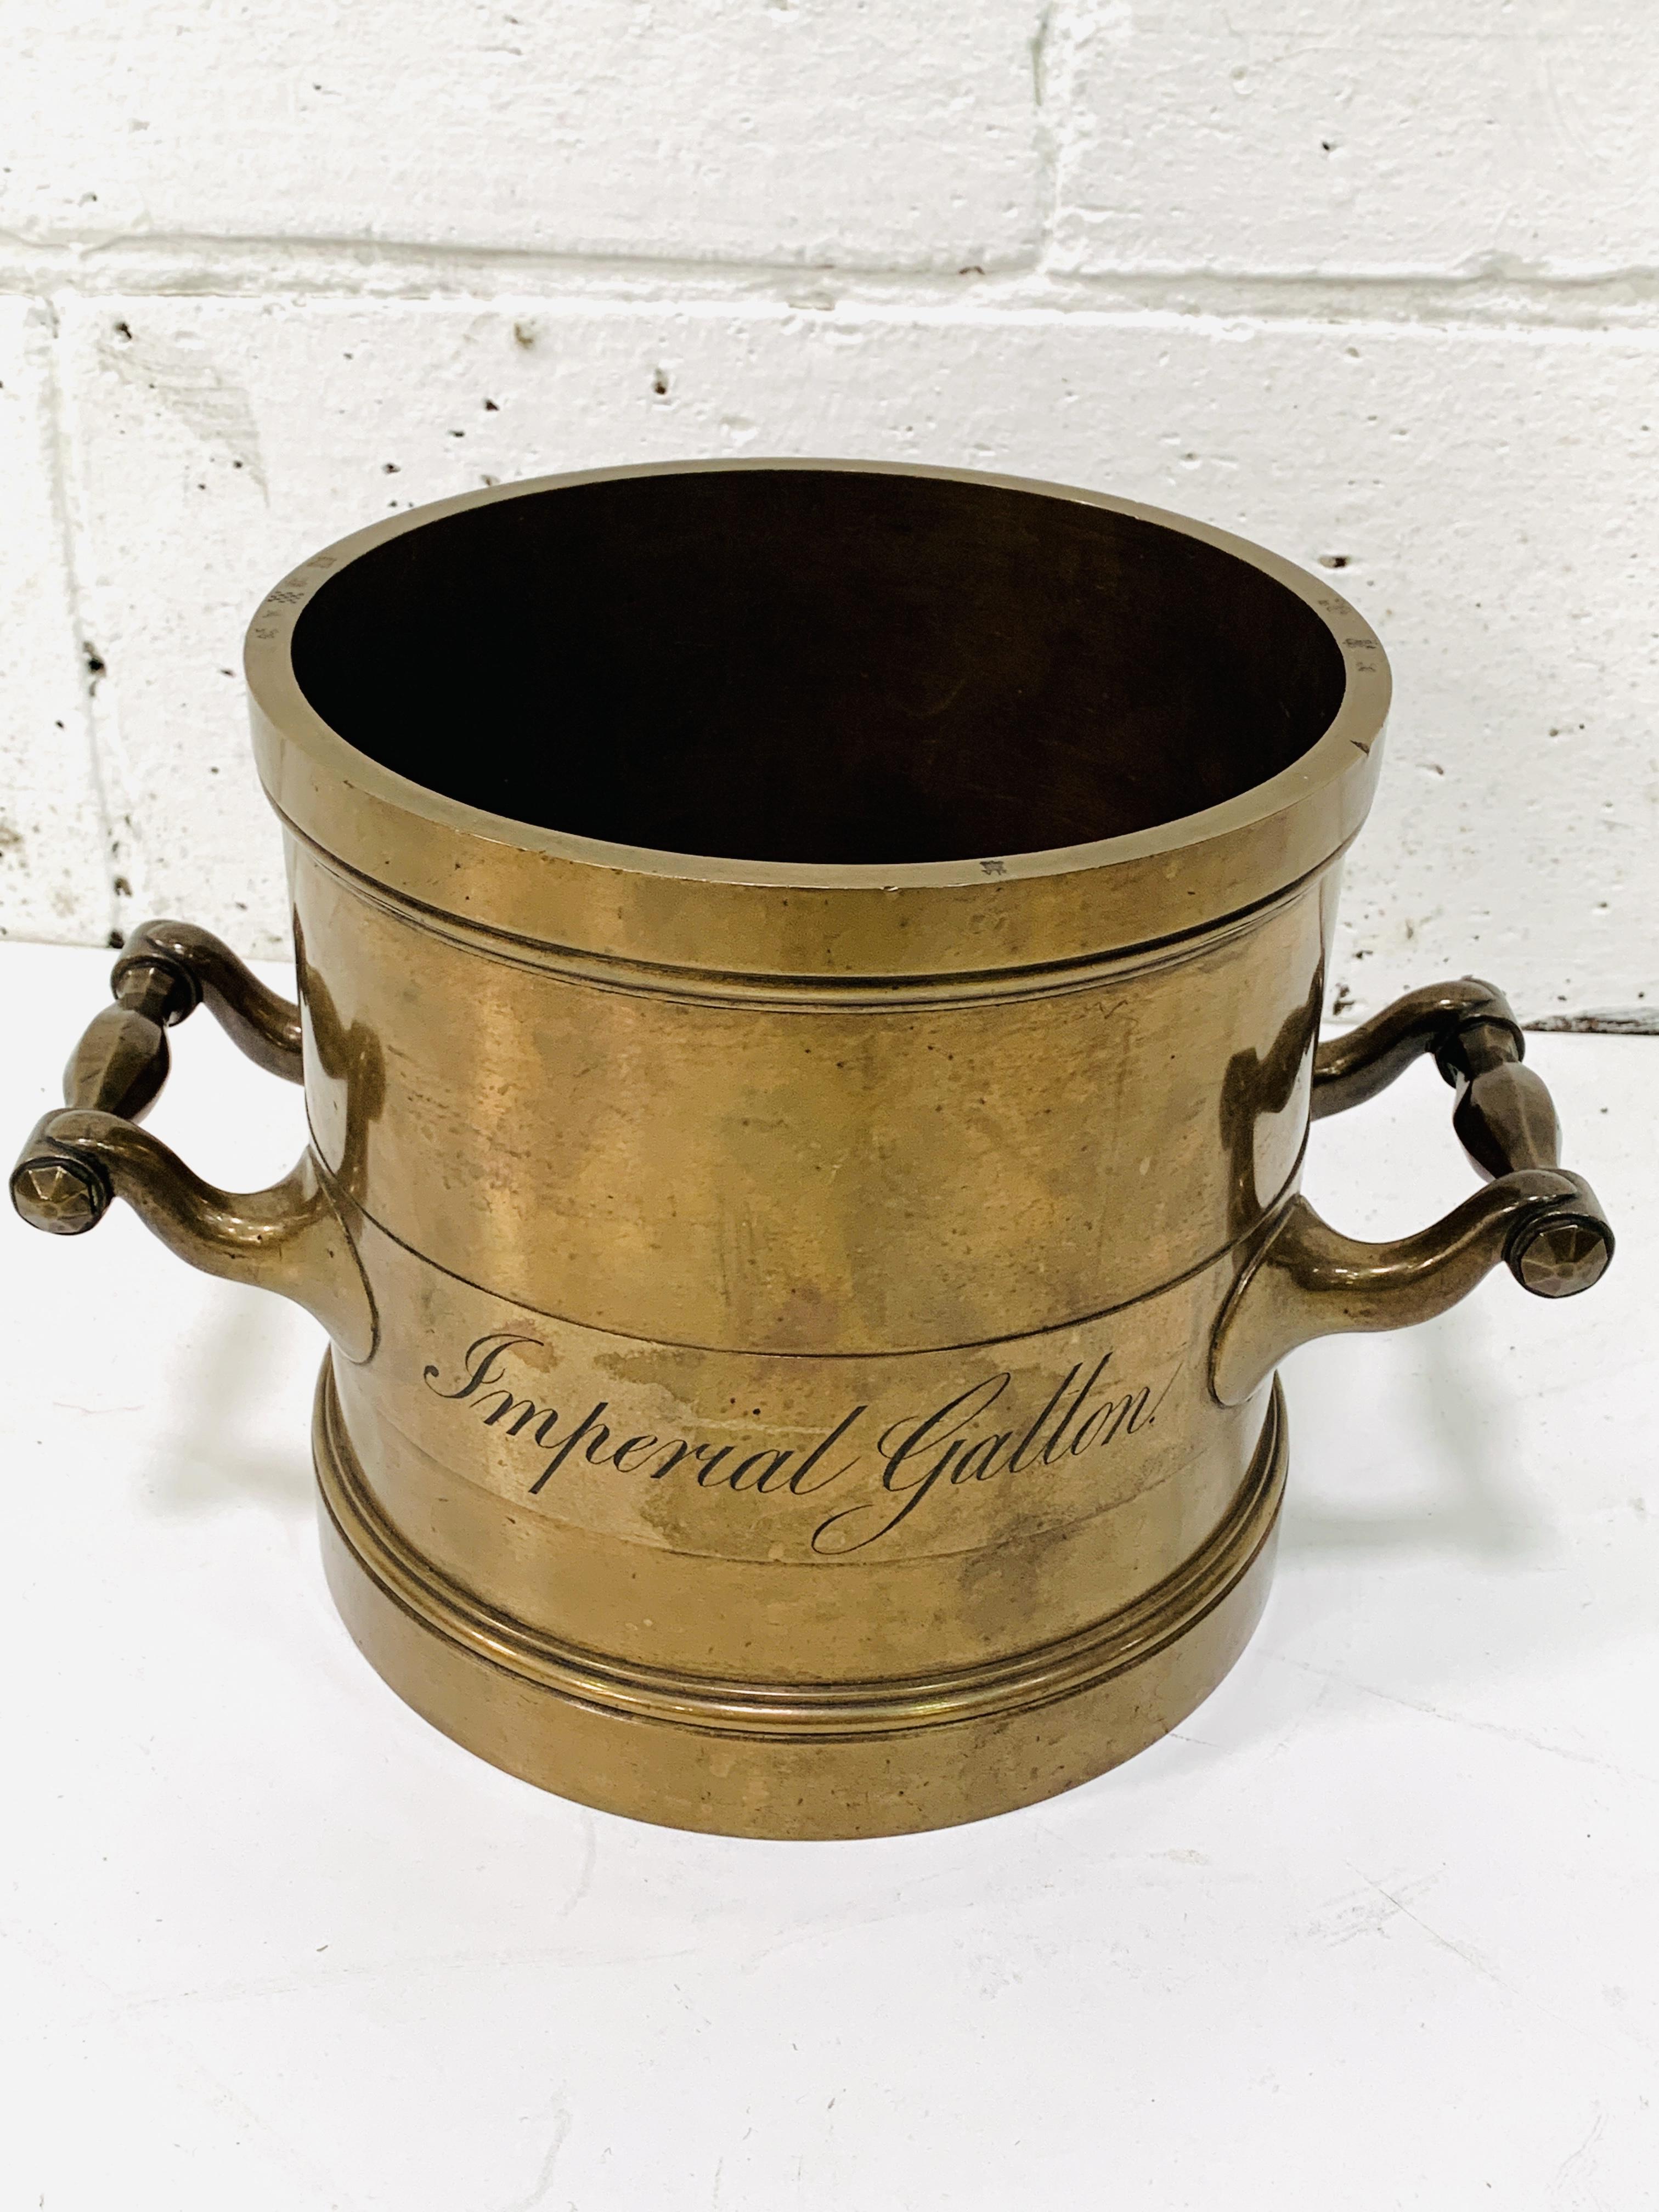 Imperial gallon bronze measure - Image 2 of 4